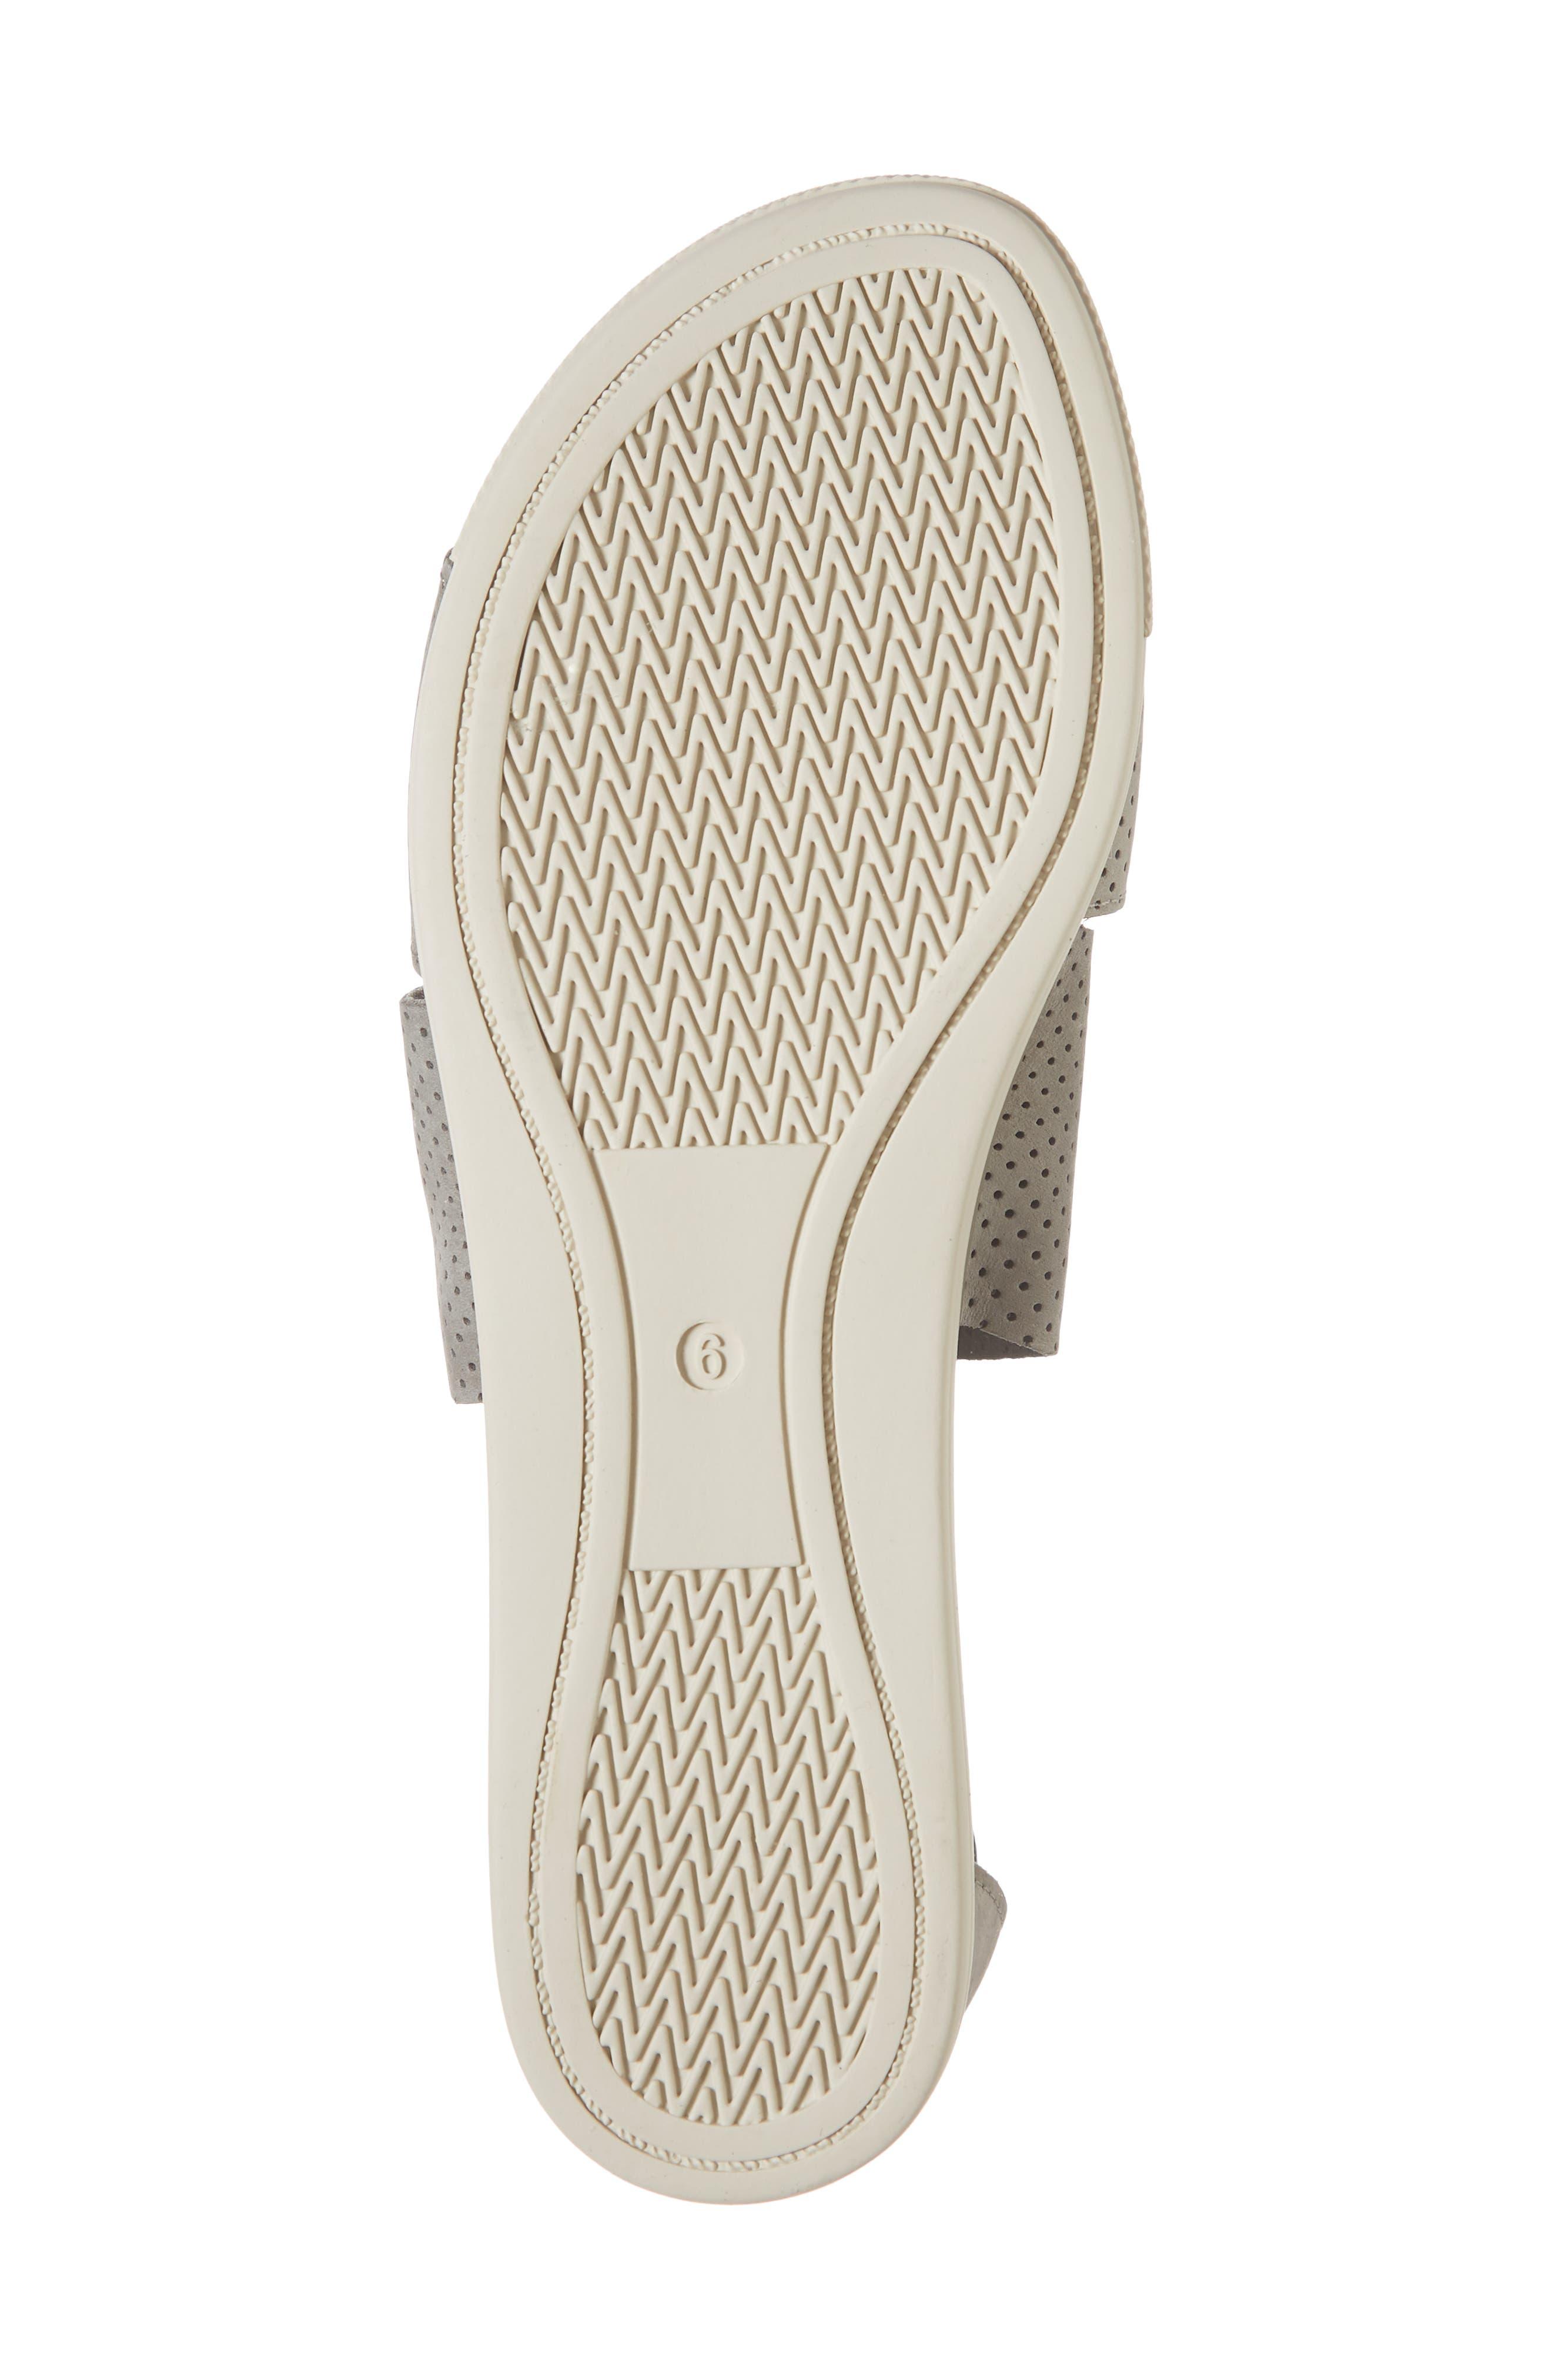 Sport Platform Sandal,                             Alternate thumbnail 6, color,                             MOON/ MOON NUBUCK